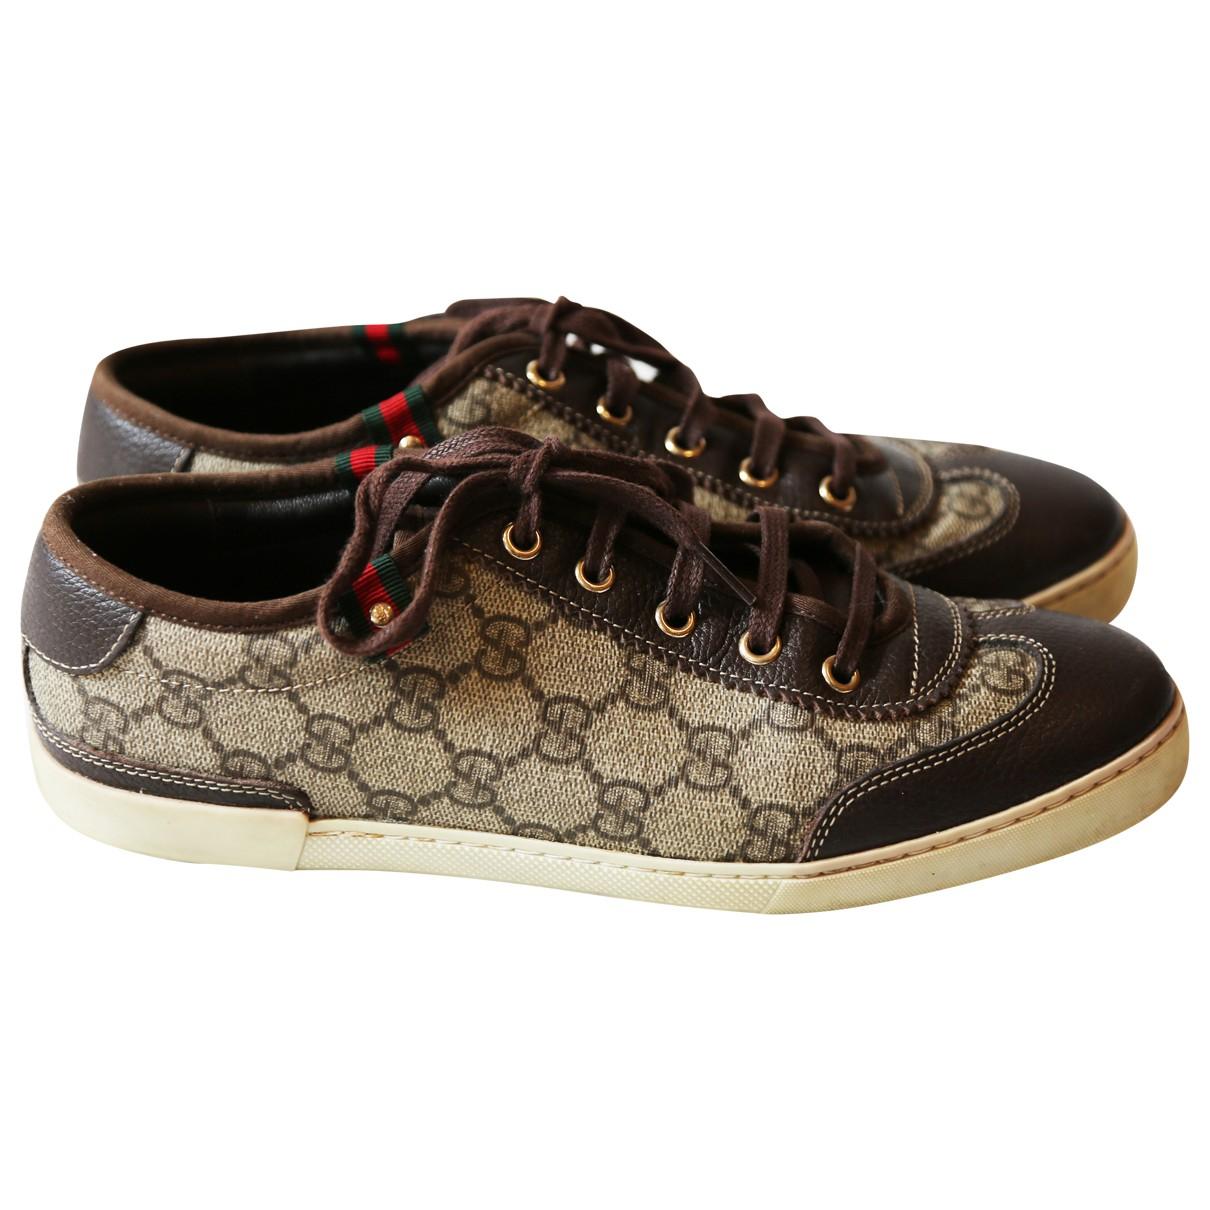 Gucci \N Sneakers in  Braun Leinen